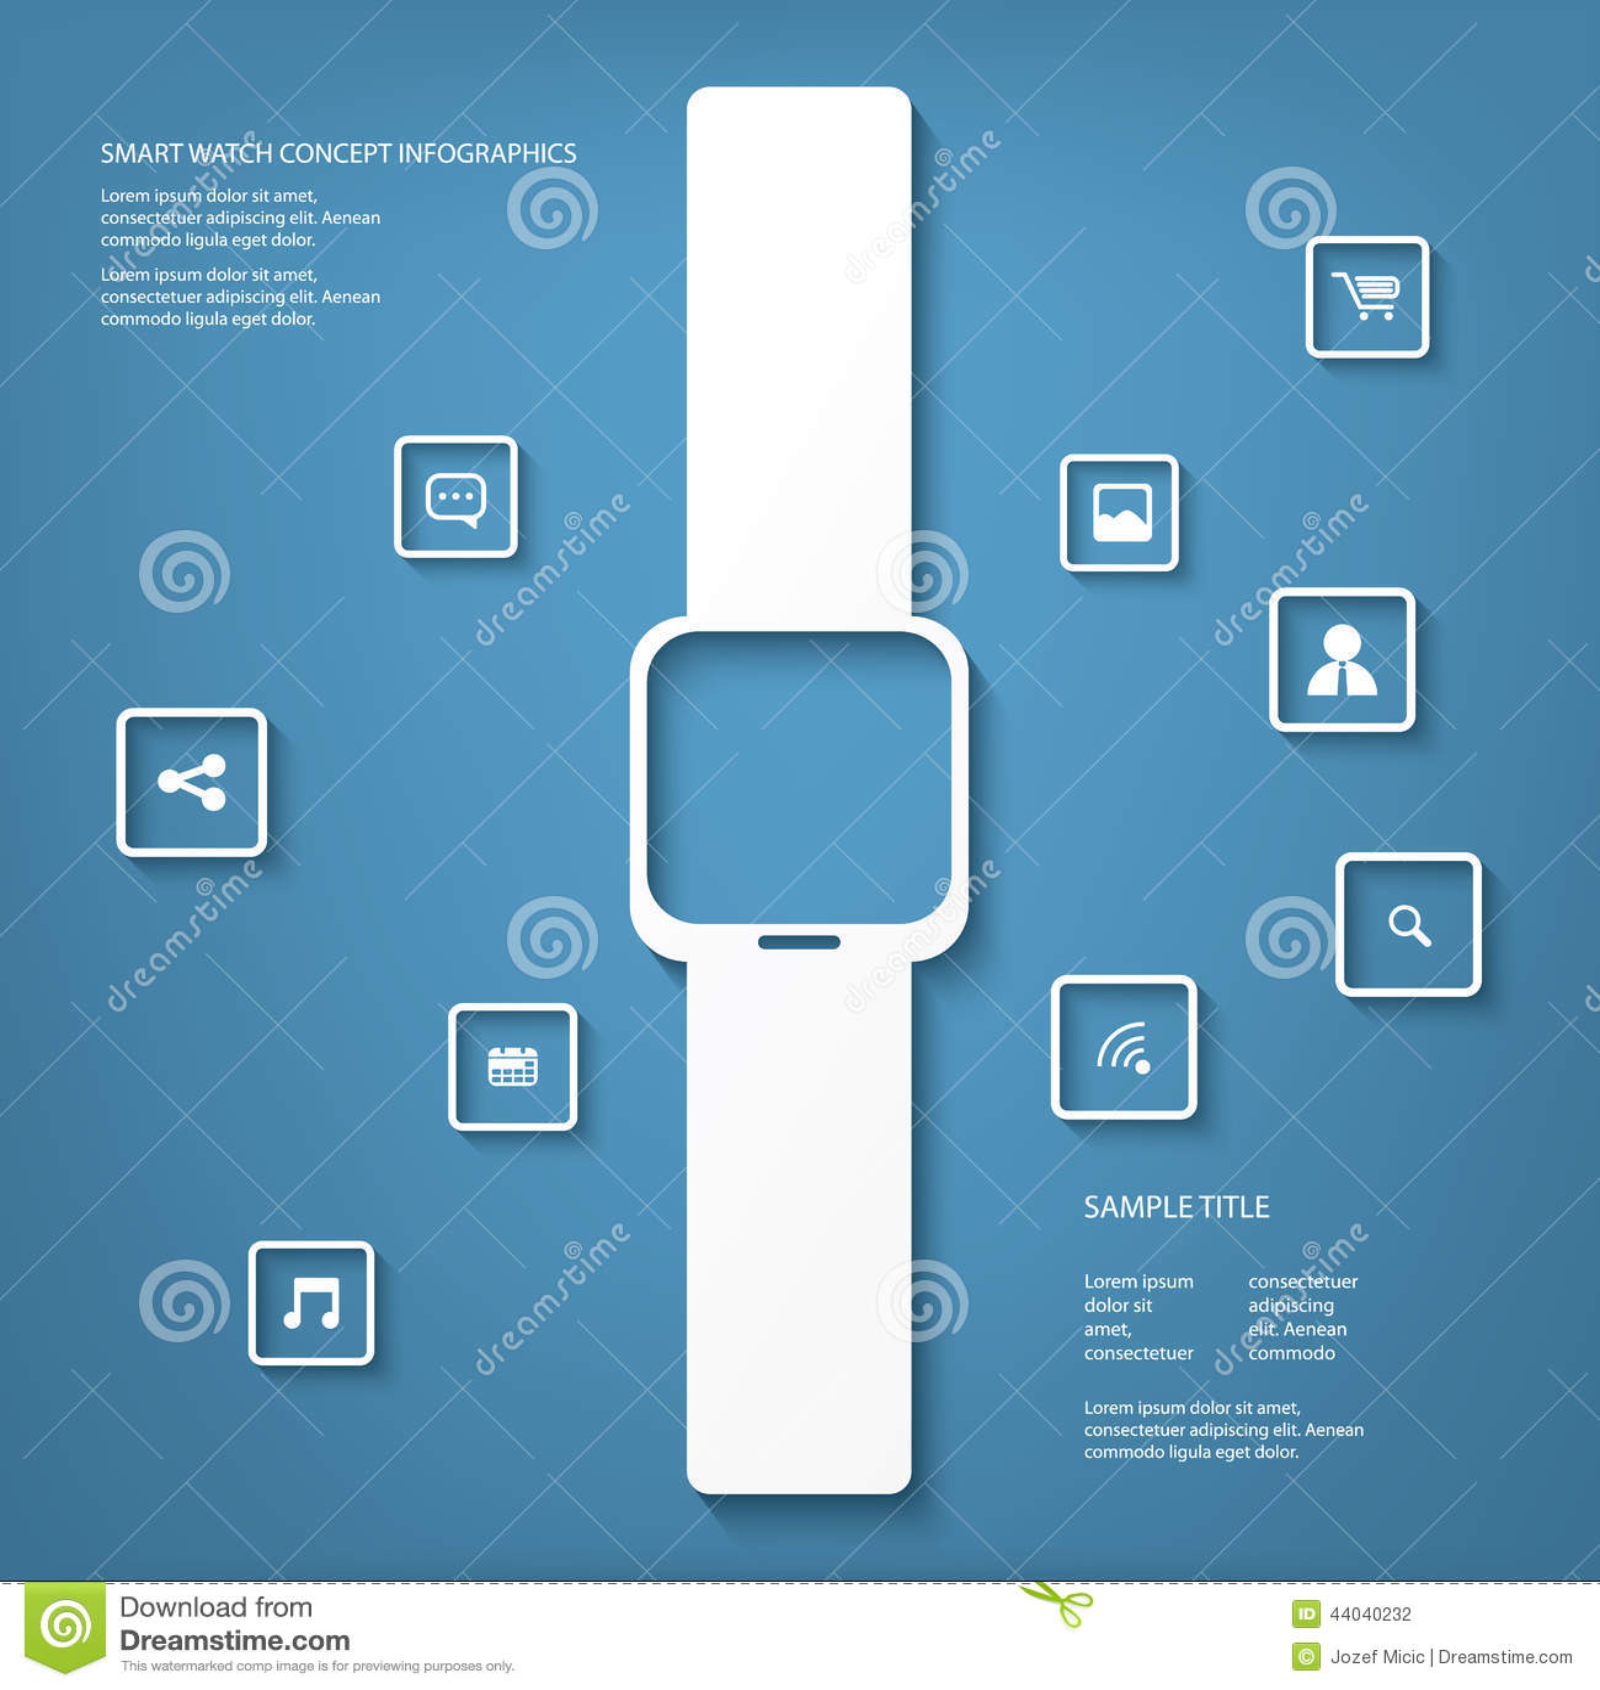 Smart Watch Concept Vector Illustration Stock Diagram Download Of Information 44040232